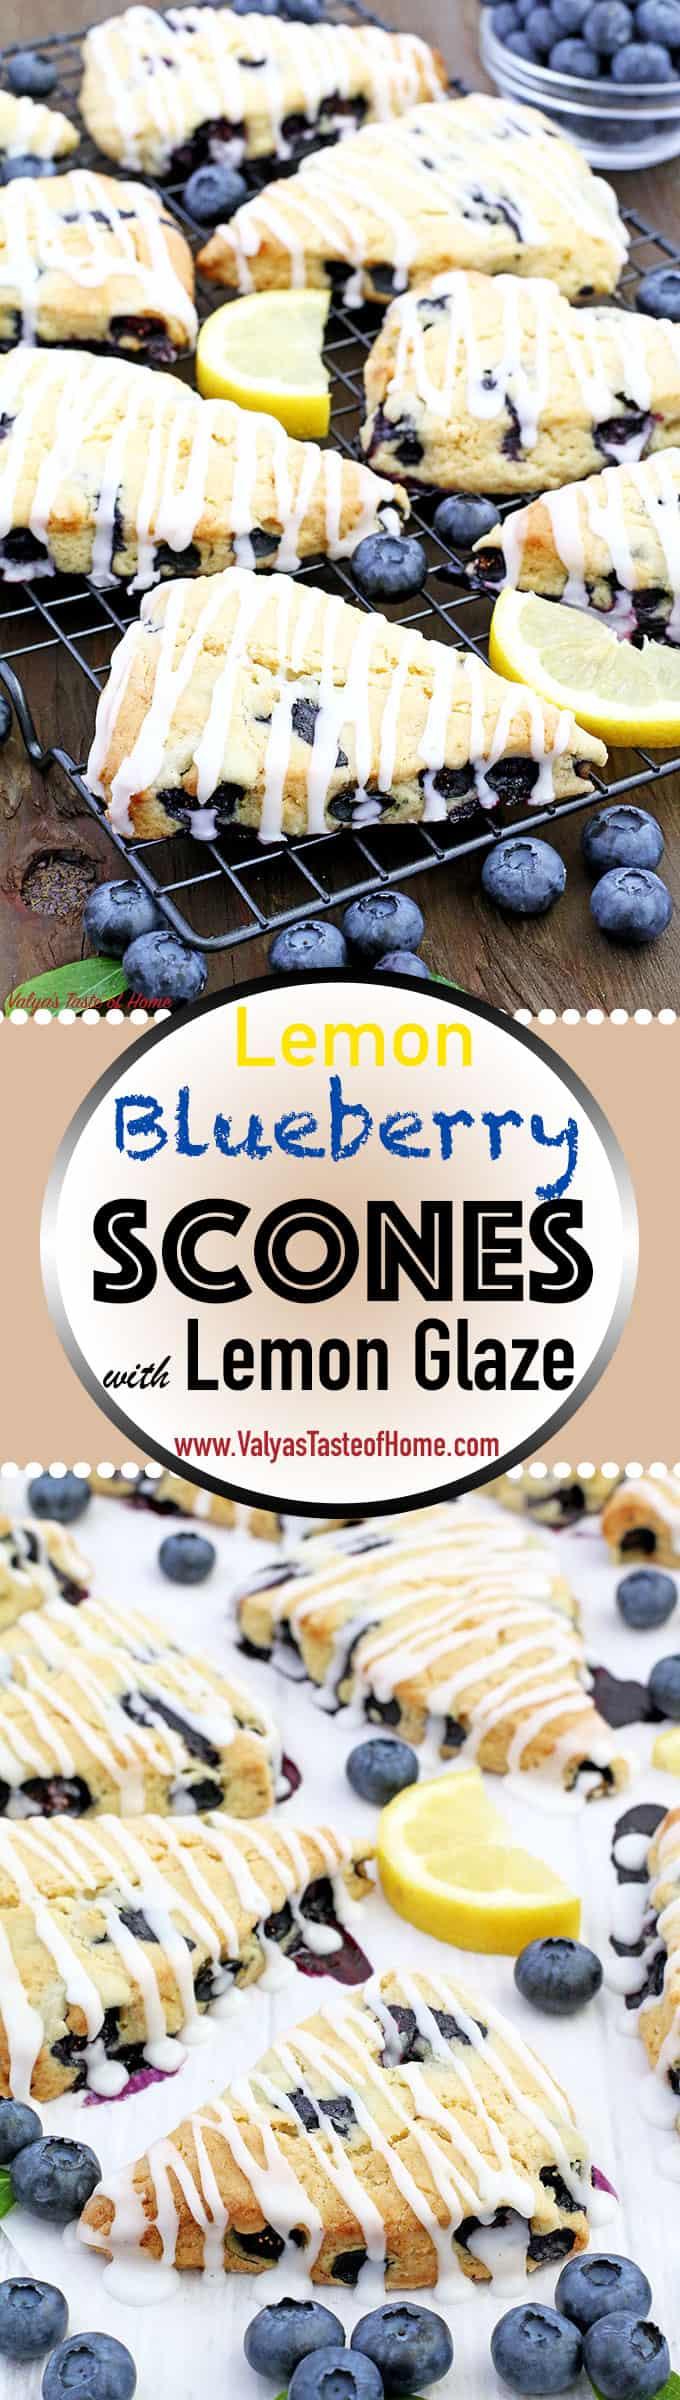 blueberries, blueberry scones, delicious, easy recipe, farm freshly picked blueberries, Lemon Blueberry Scones, Lemon Blueberry Scones with Lemon Glaze, Lemon Glaze, piper farm blueberries, scones, soft and flaky, summer baking